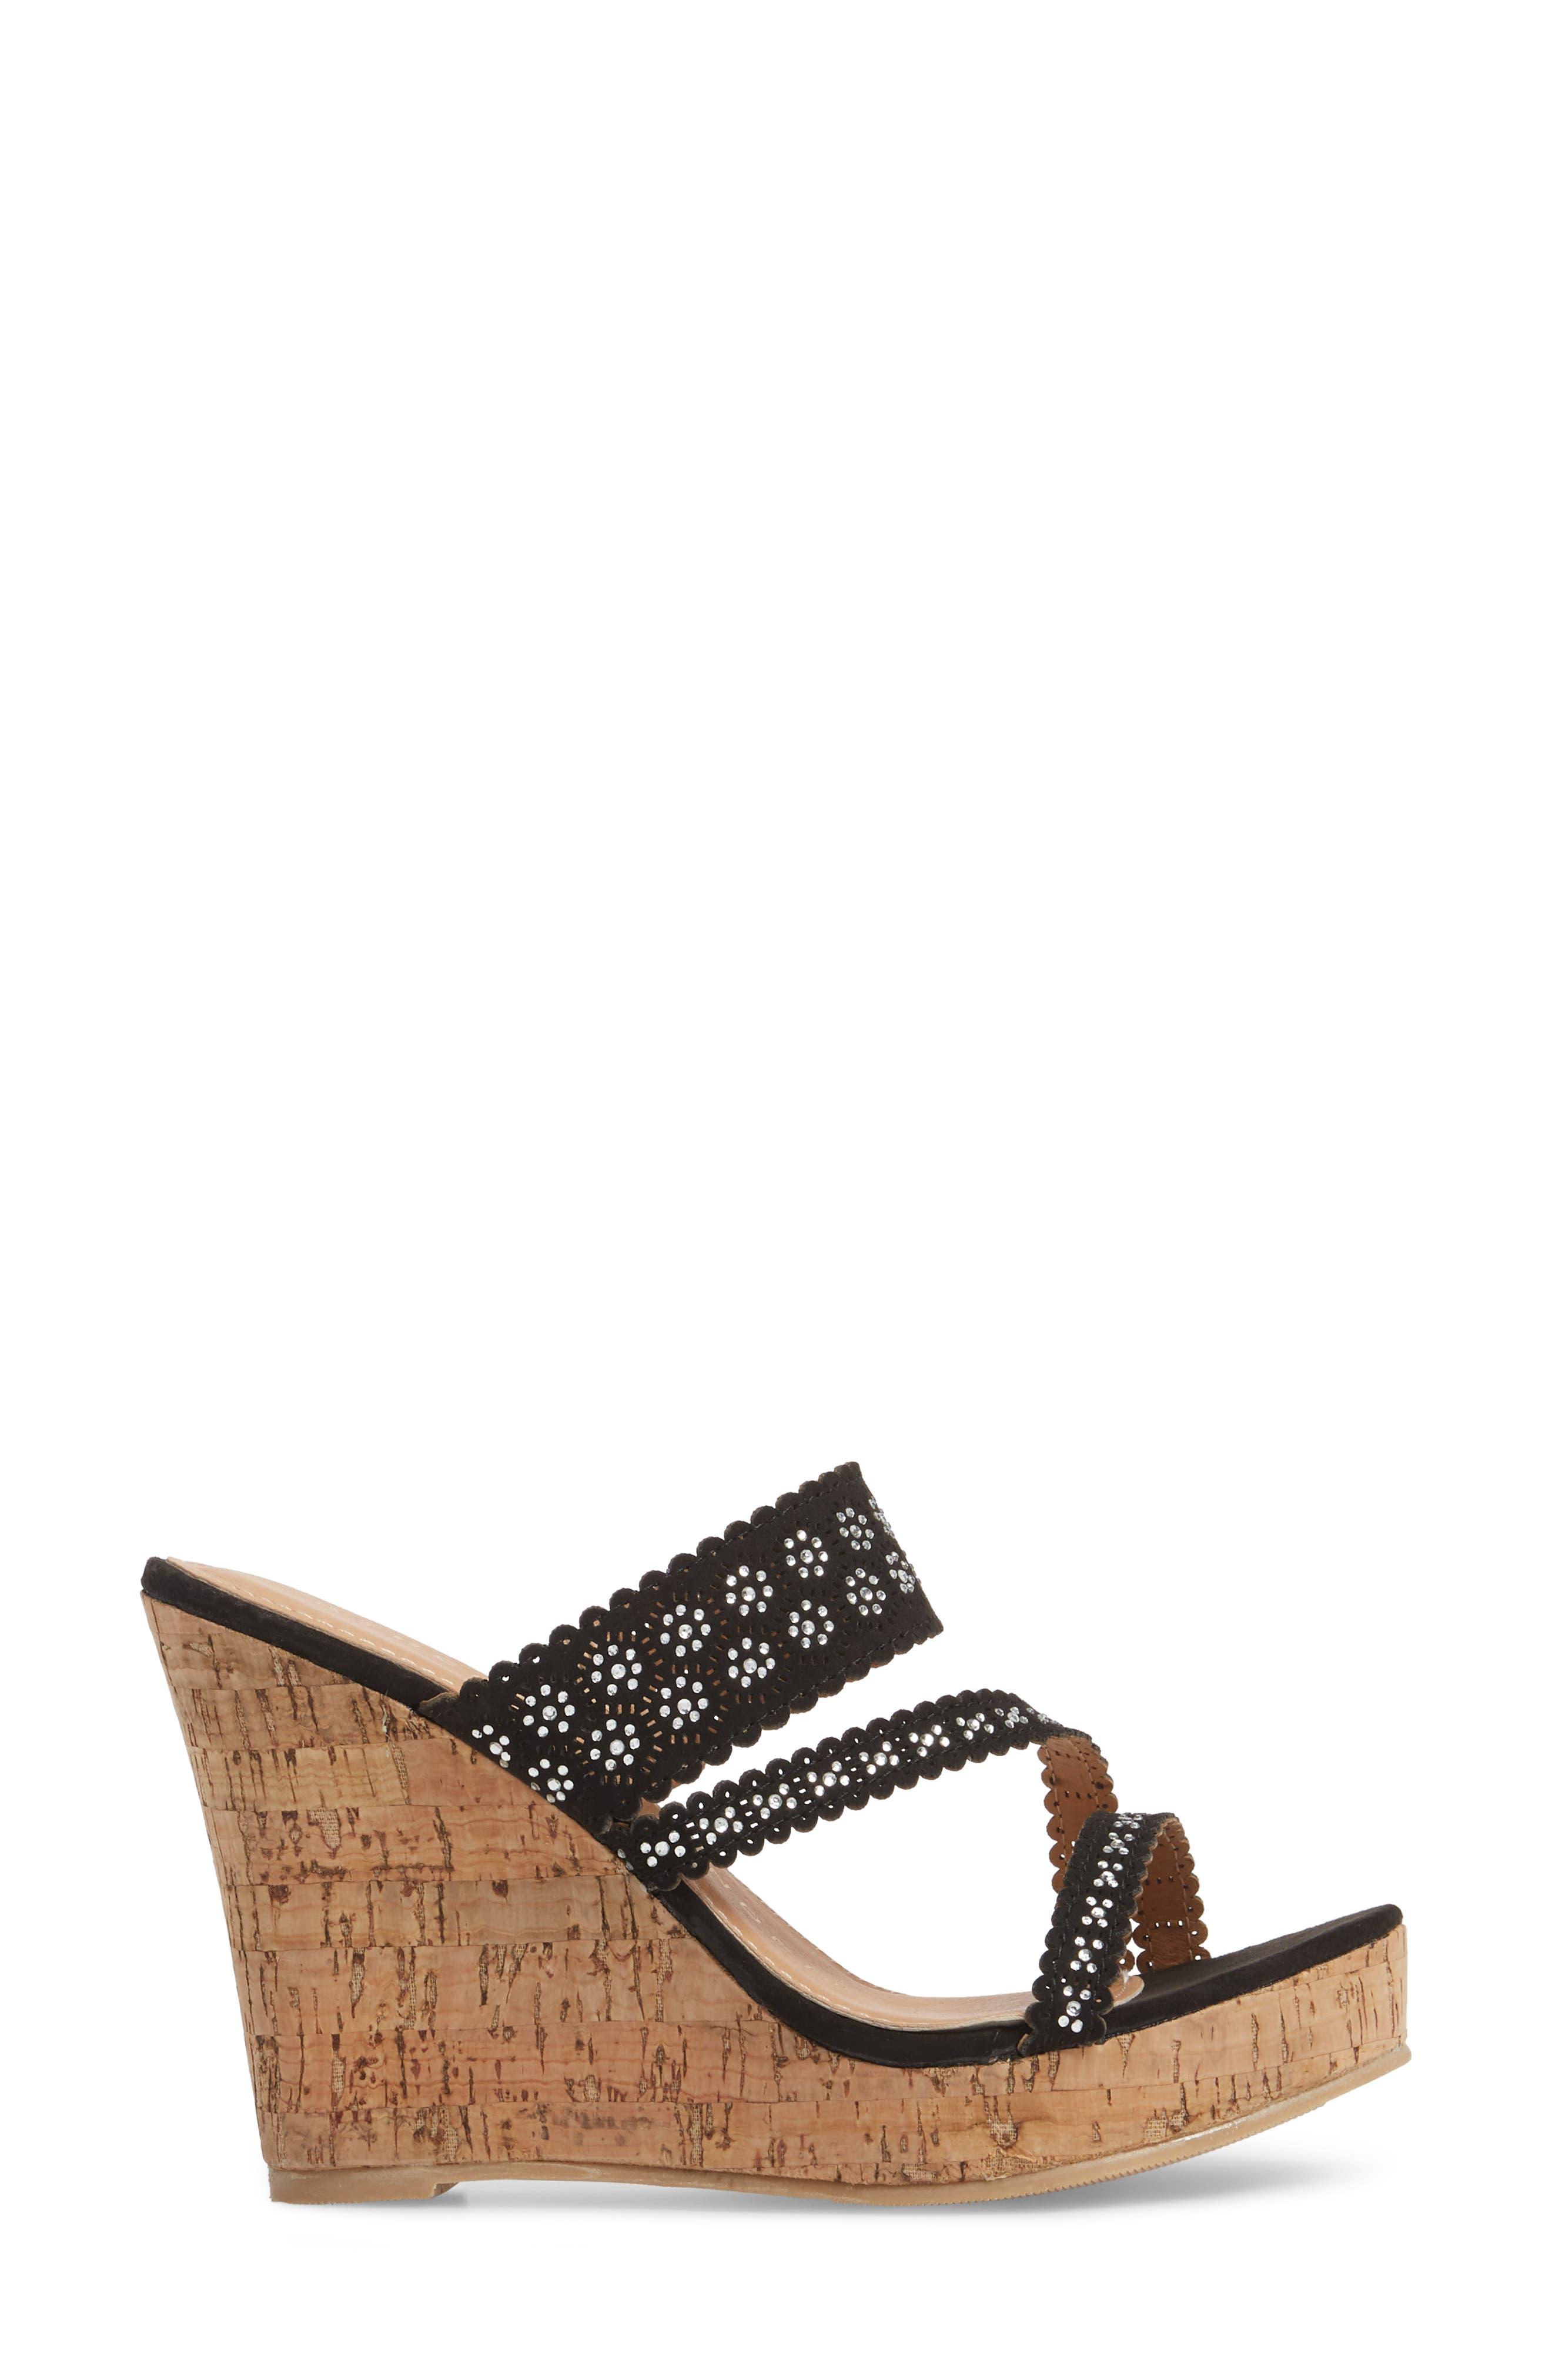 Alternate Image 3  - Athena Alexander Aerin Embellished Wedge Sandal (Women)